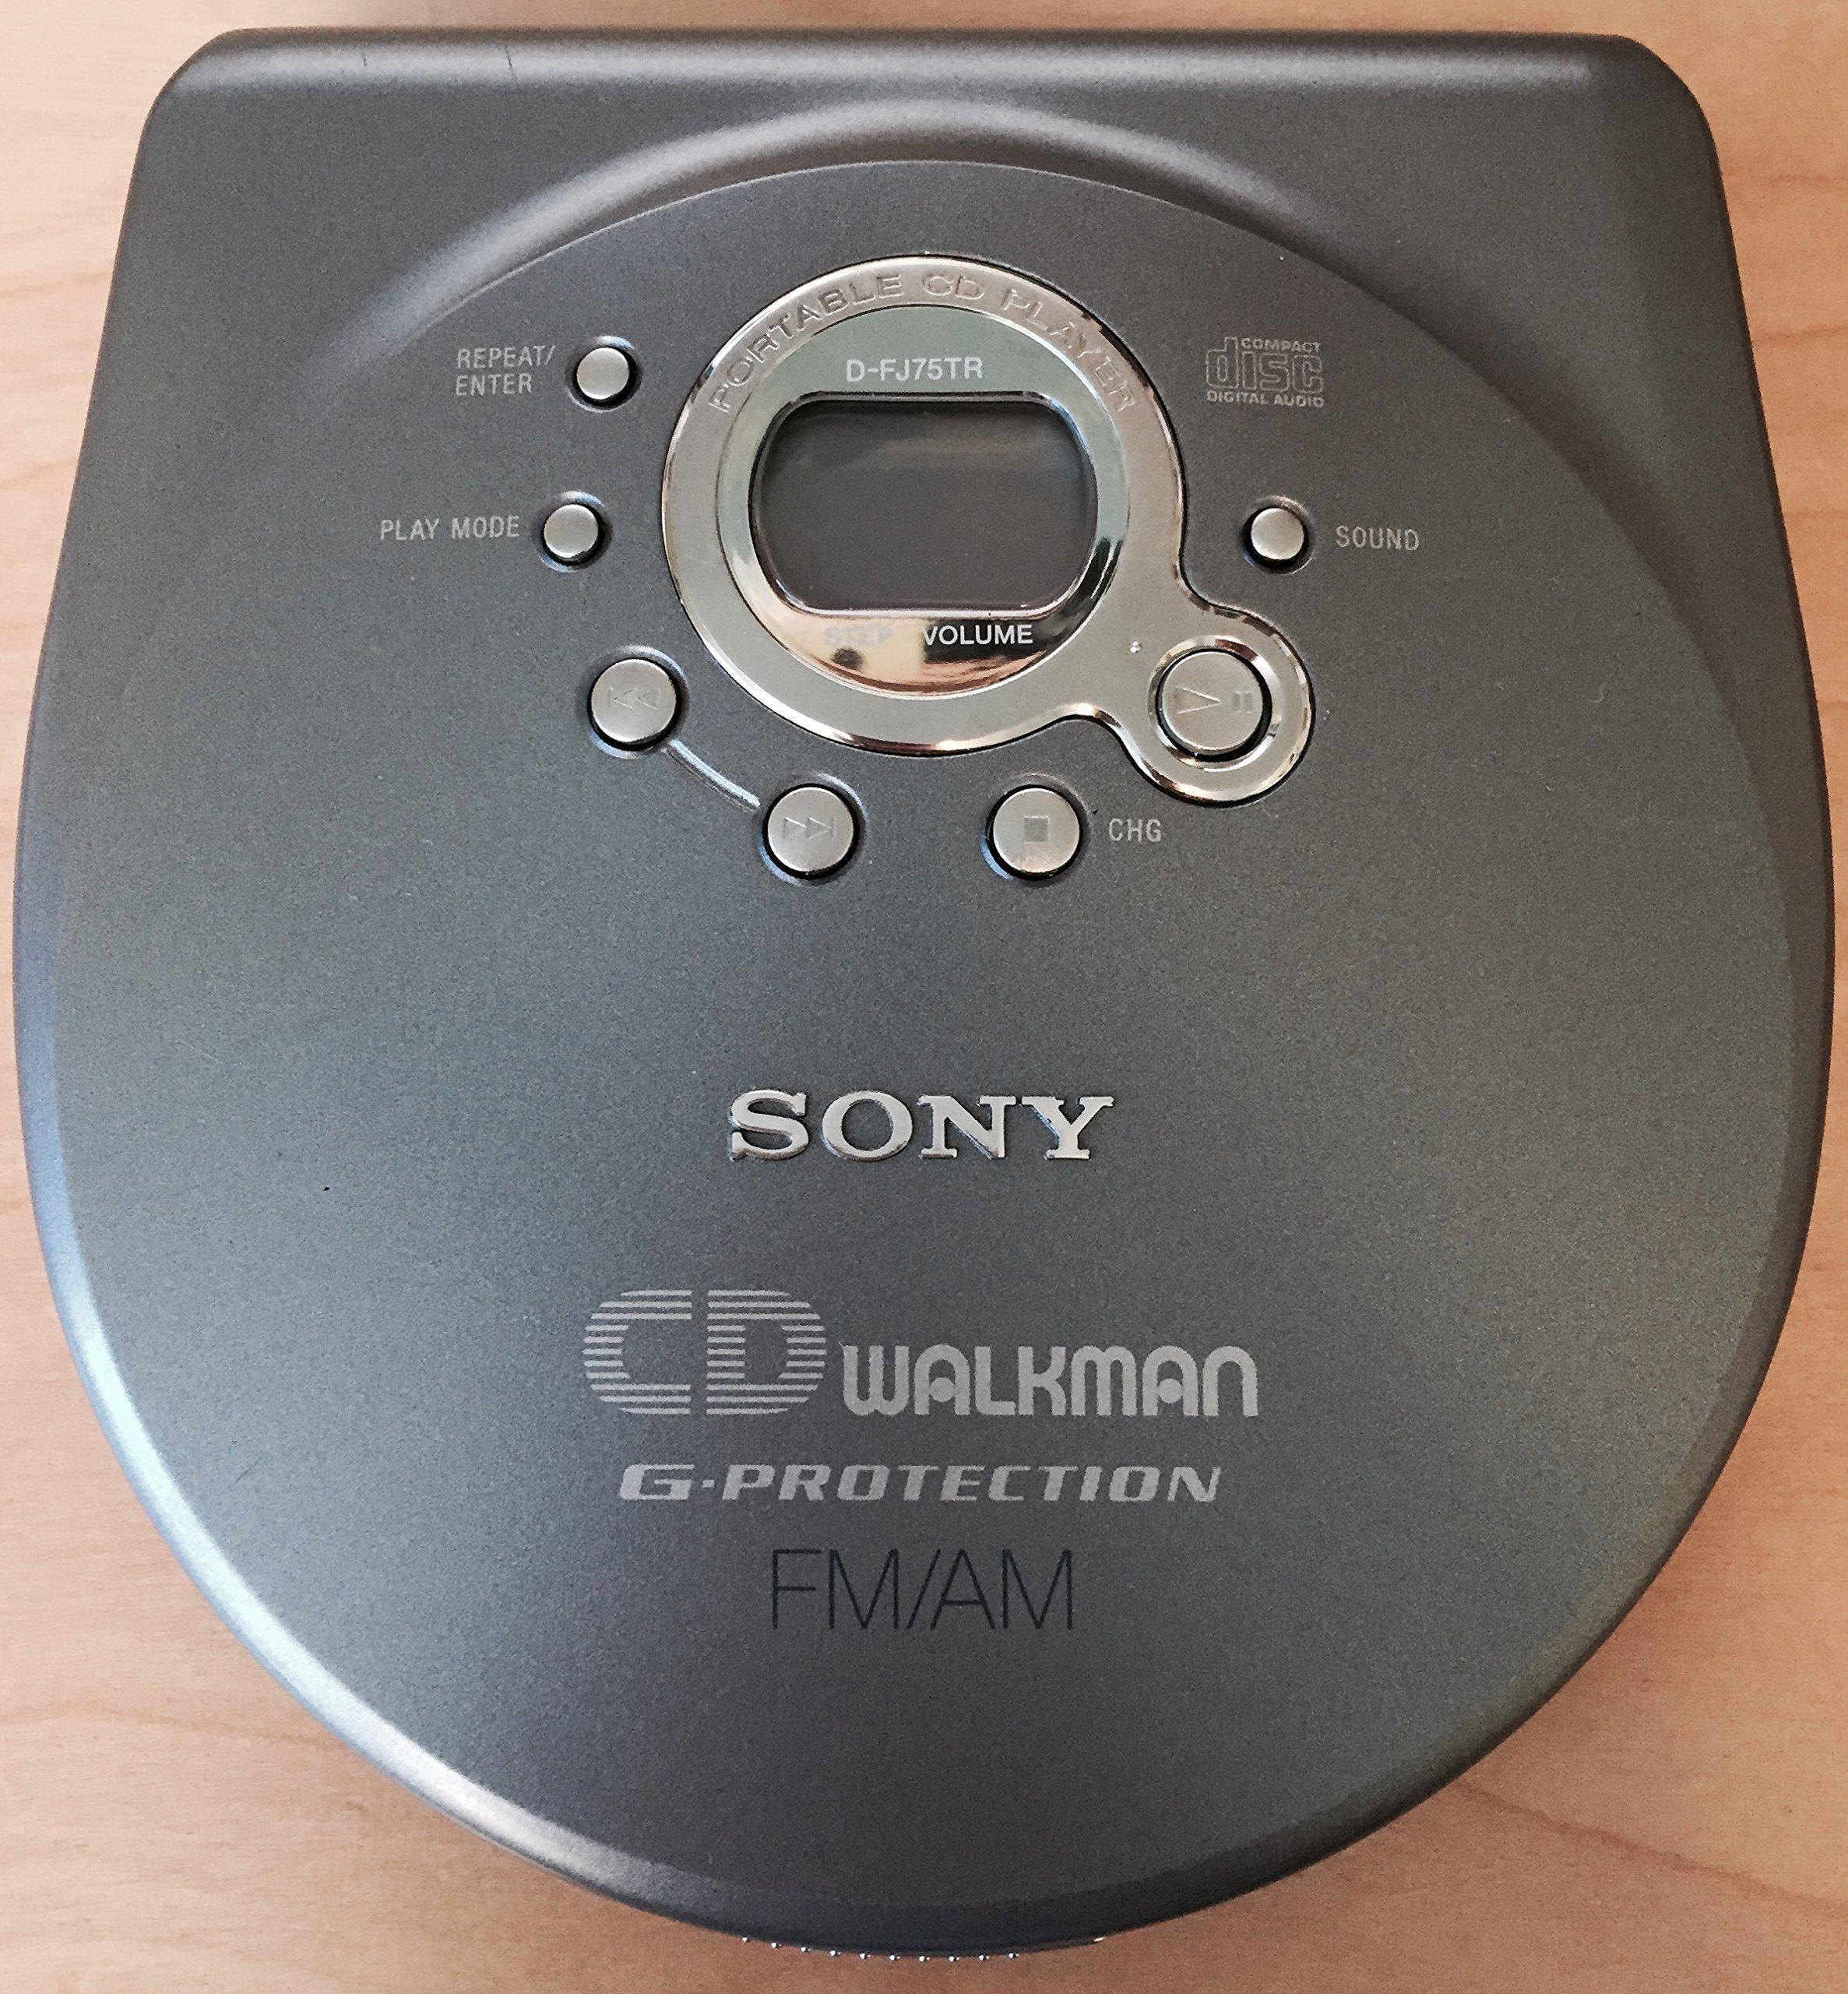 Sony CD Walkman D-FJ75TR - CD player - silver